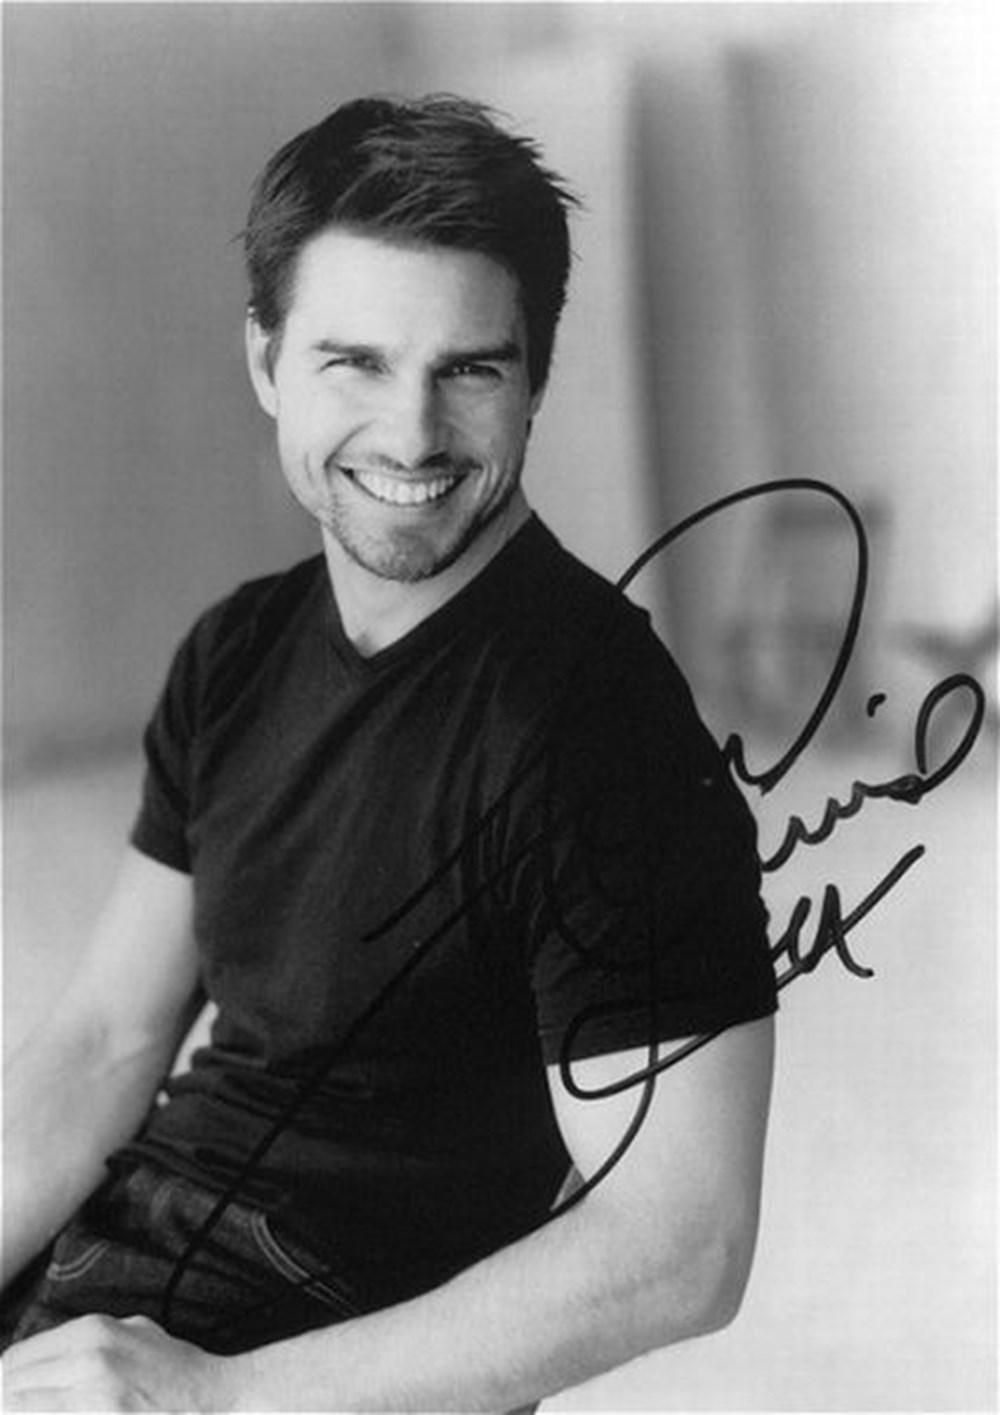 photo star tom cruise autographe signee 07